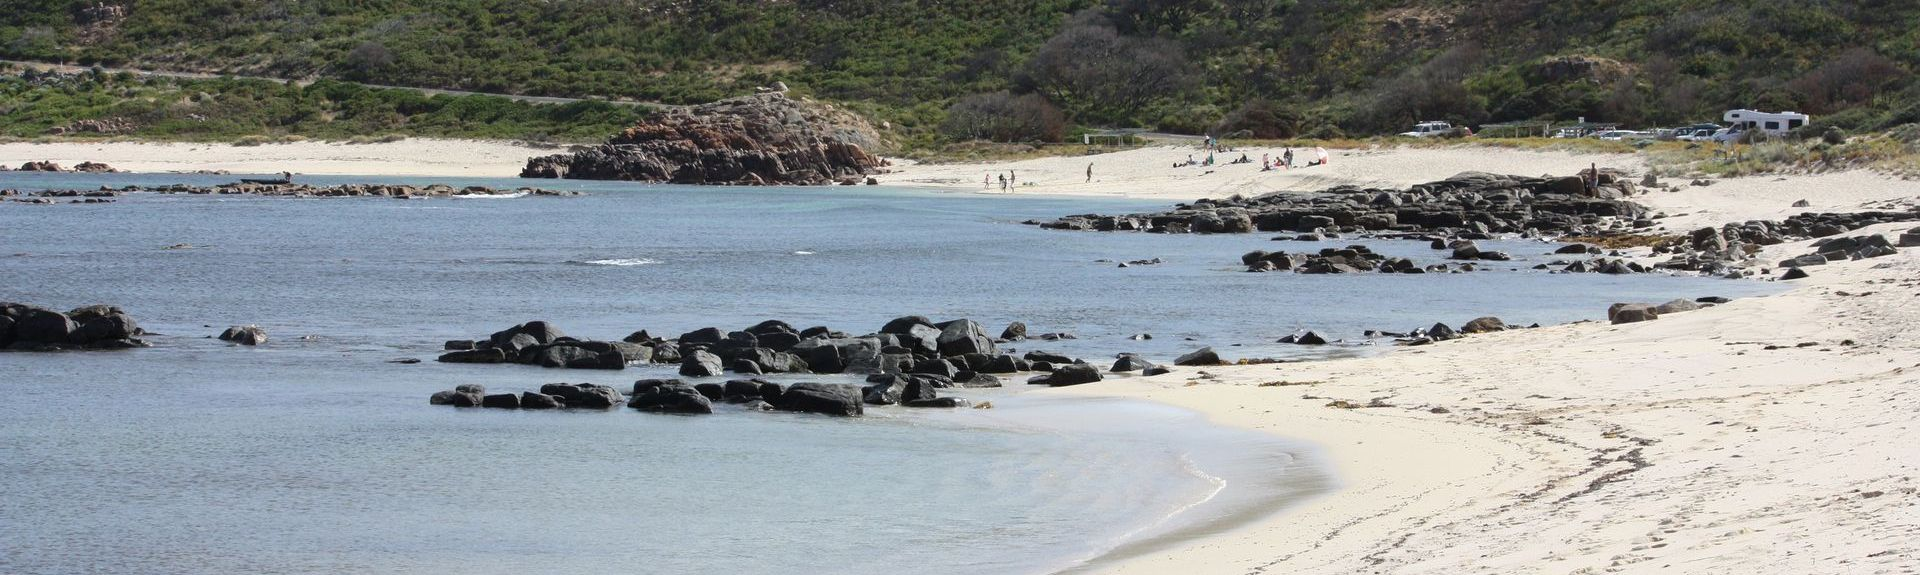 Gnarabup, Western Australia, Australia